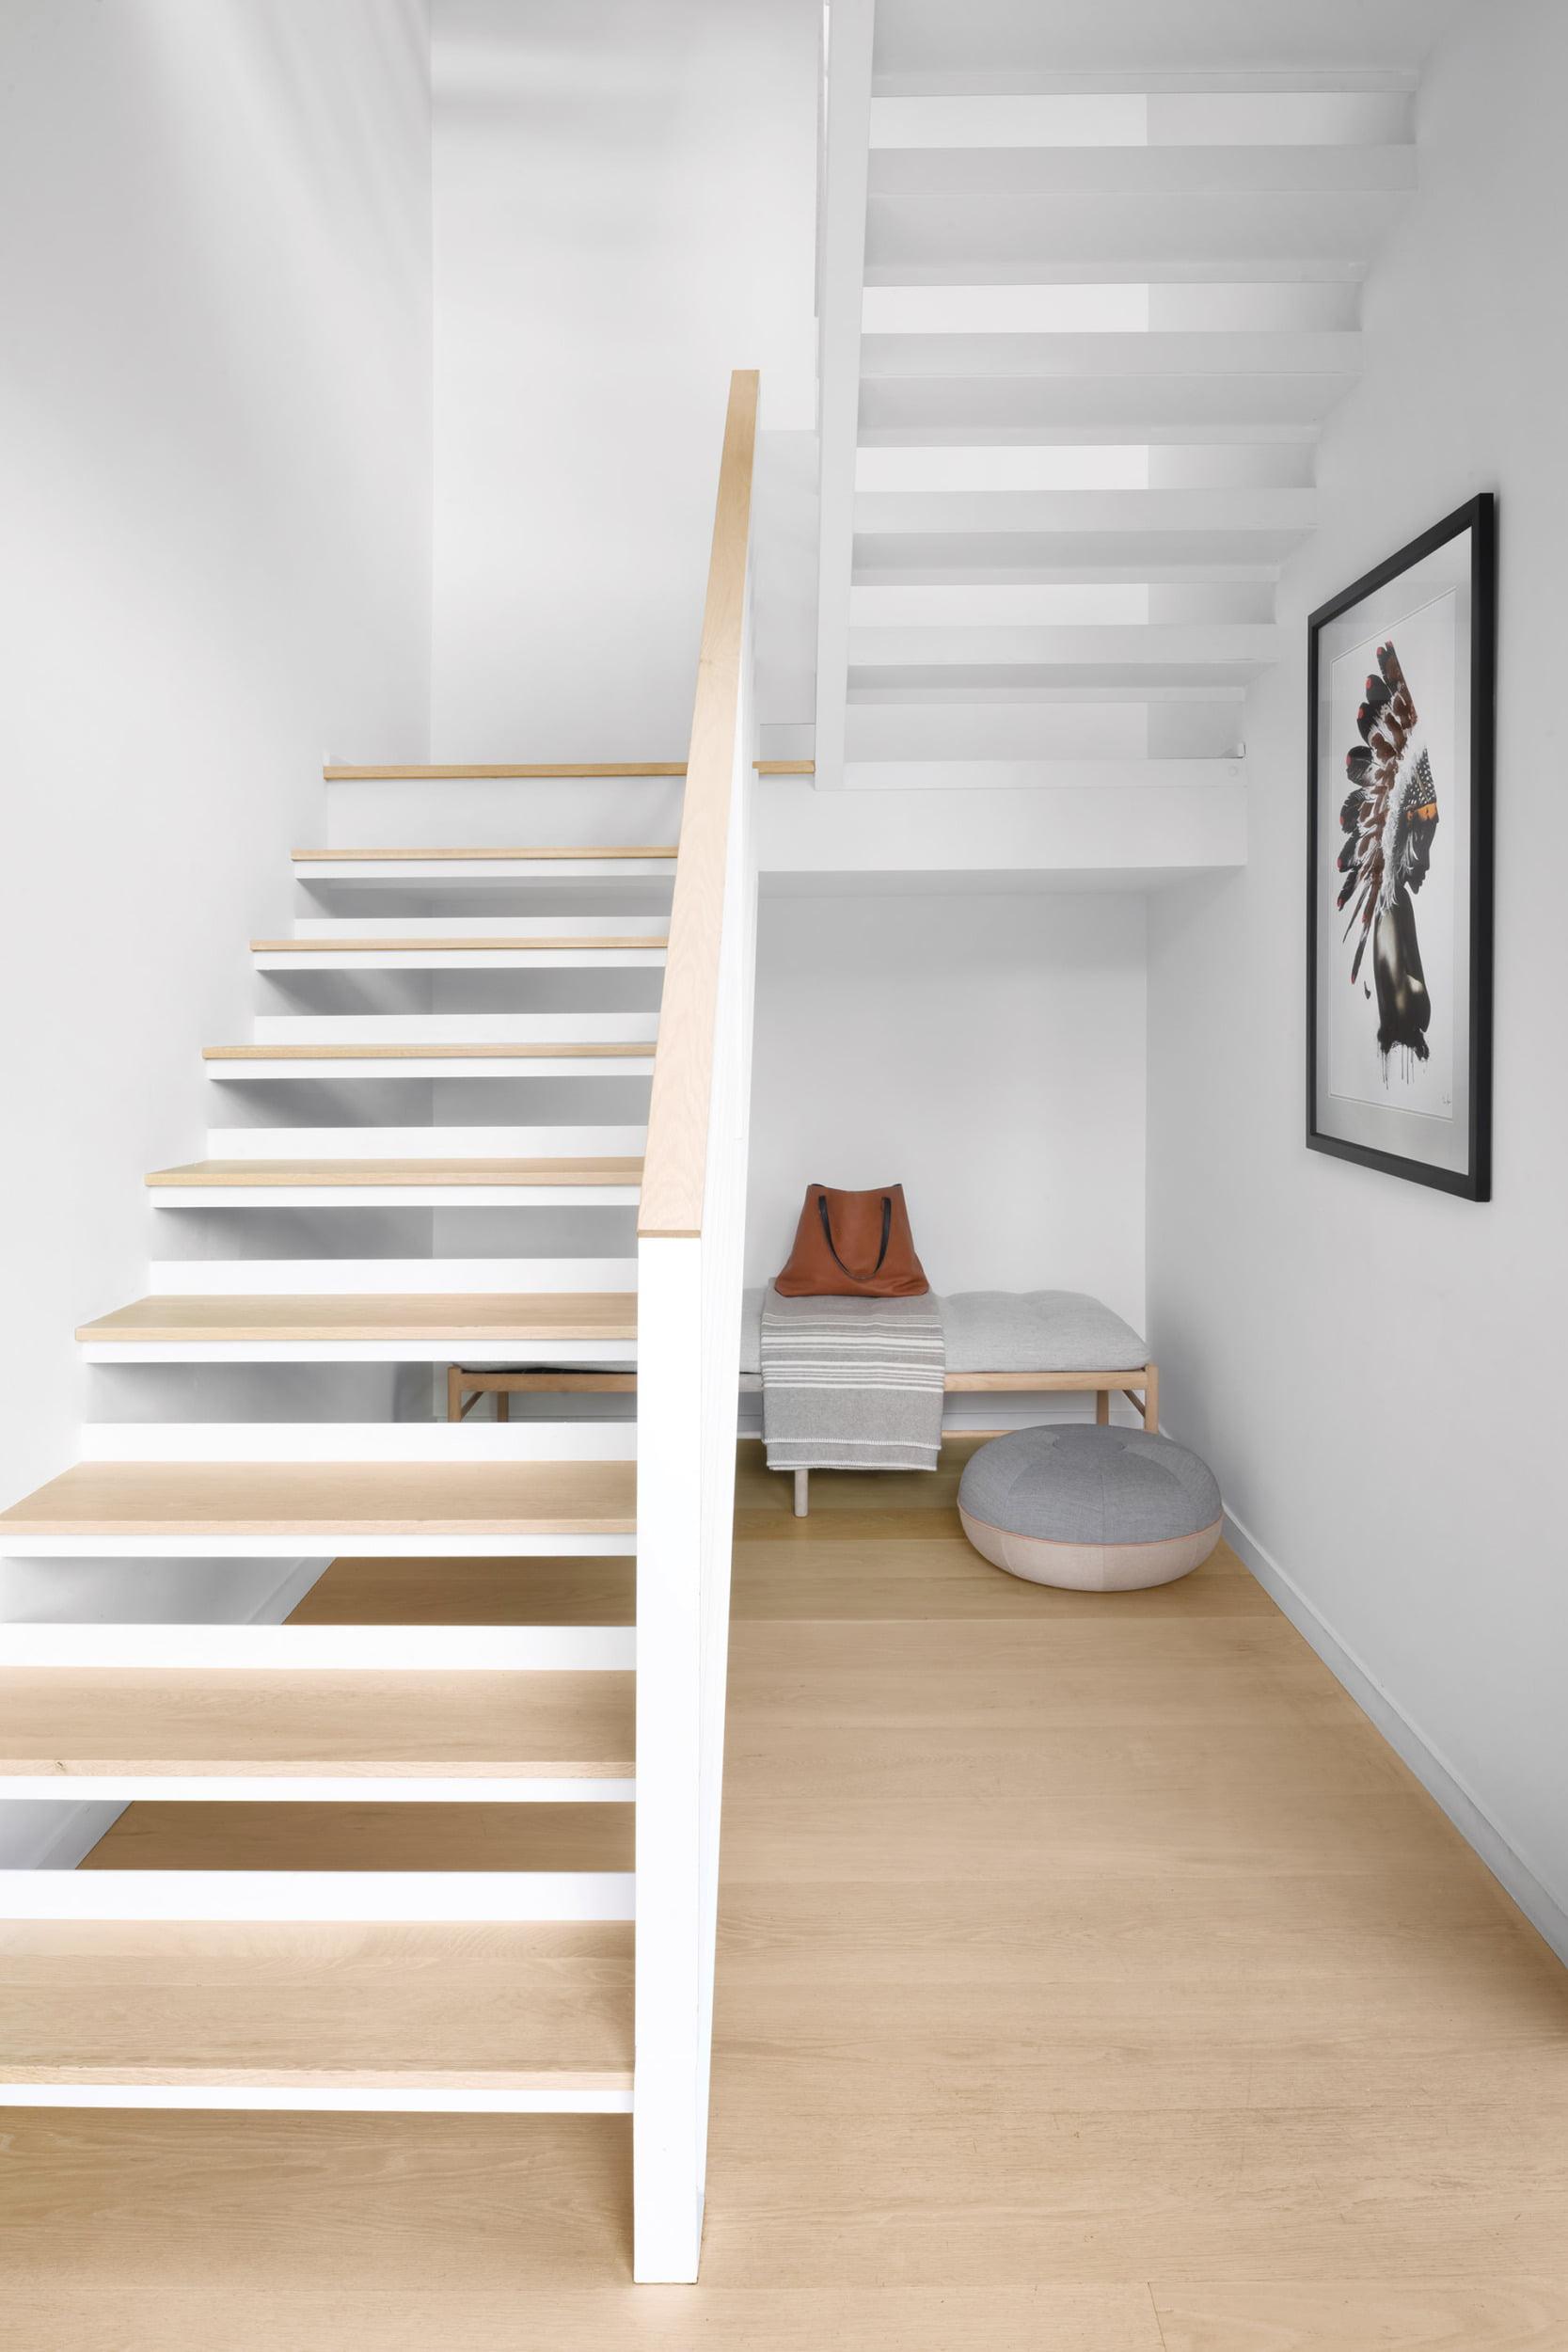 Ole Wanscher Daybed和Fritz Hansen的Cecilie Manz Pouf,在白色橡木和钢铁楼梯下。